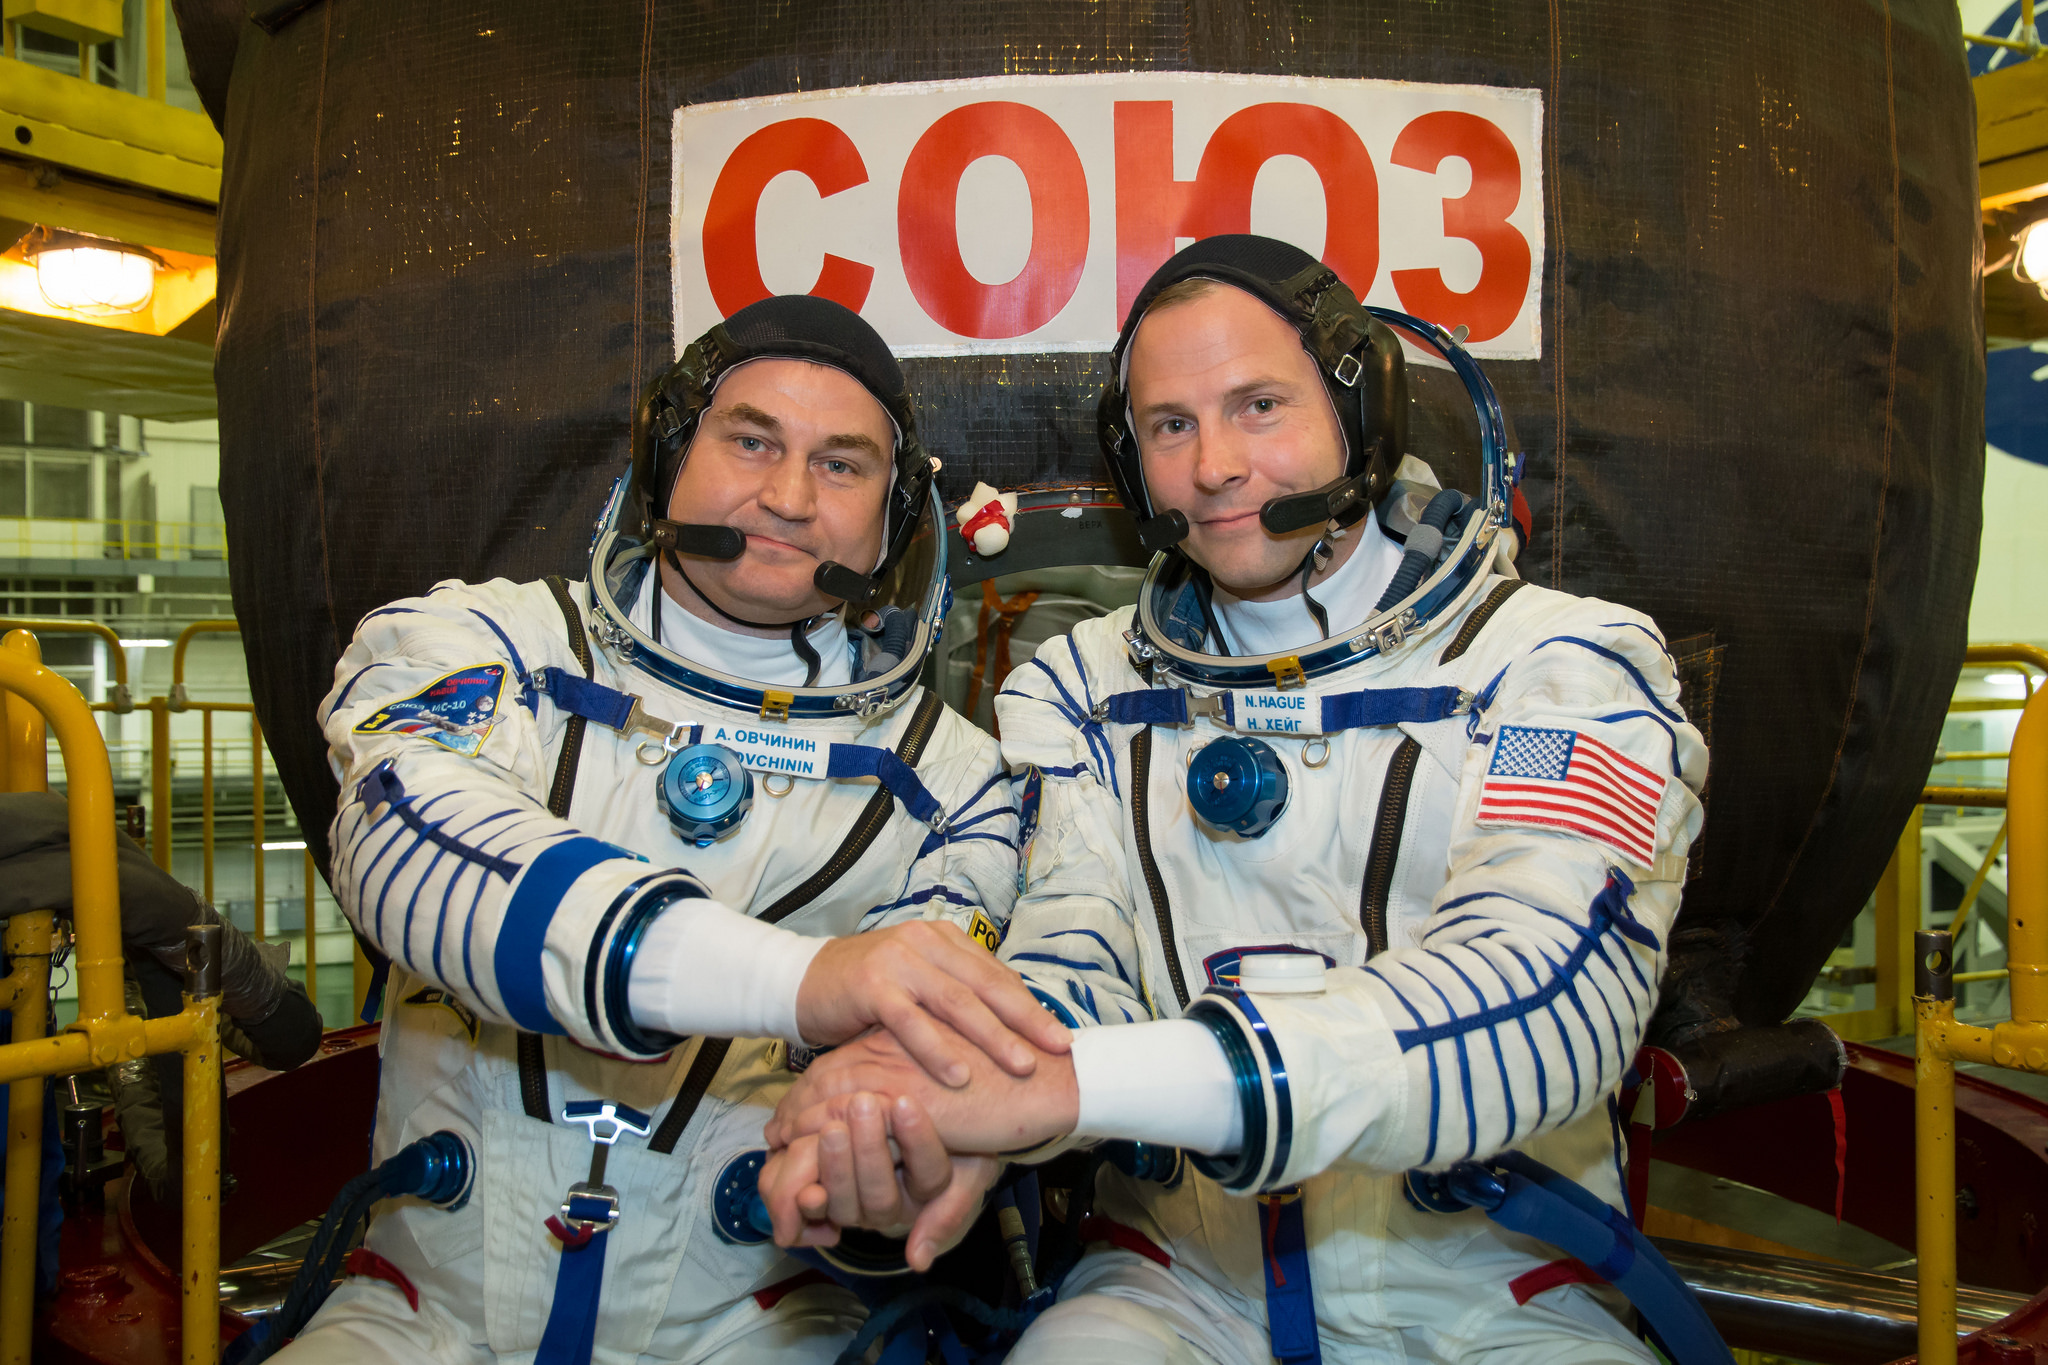 Soyuz capsule carrying 3 crew land safely in Kazakhstan